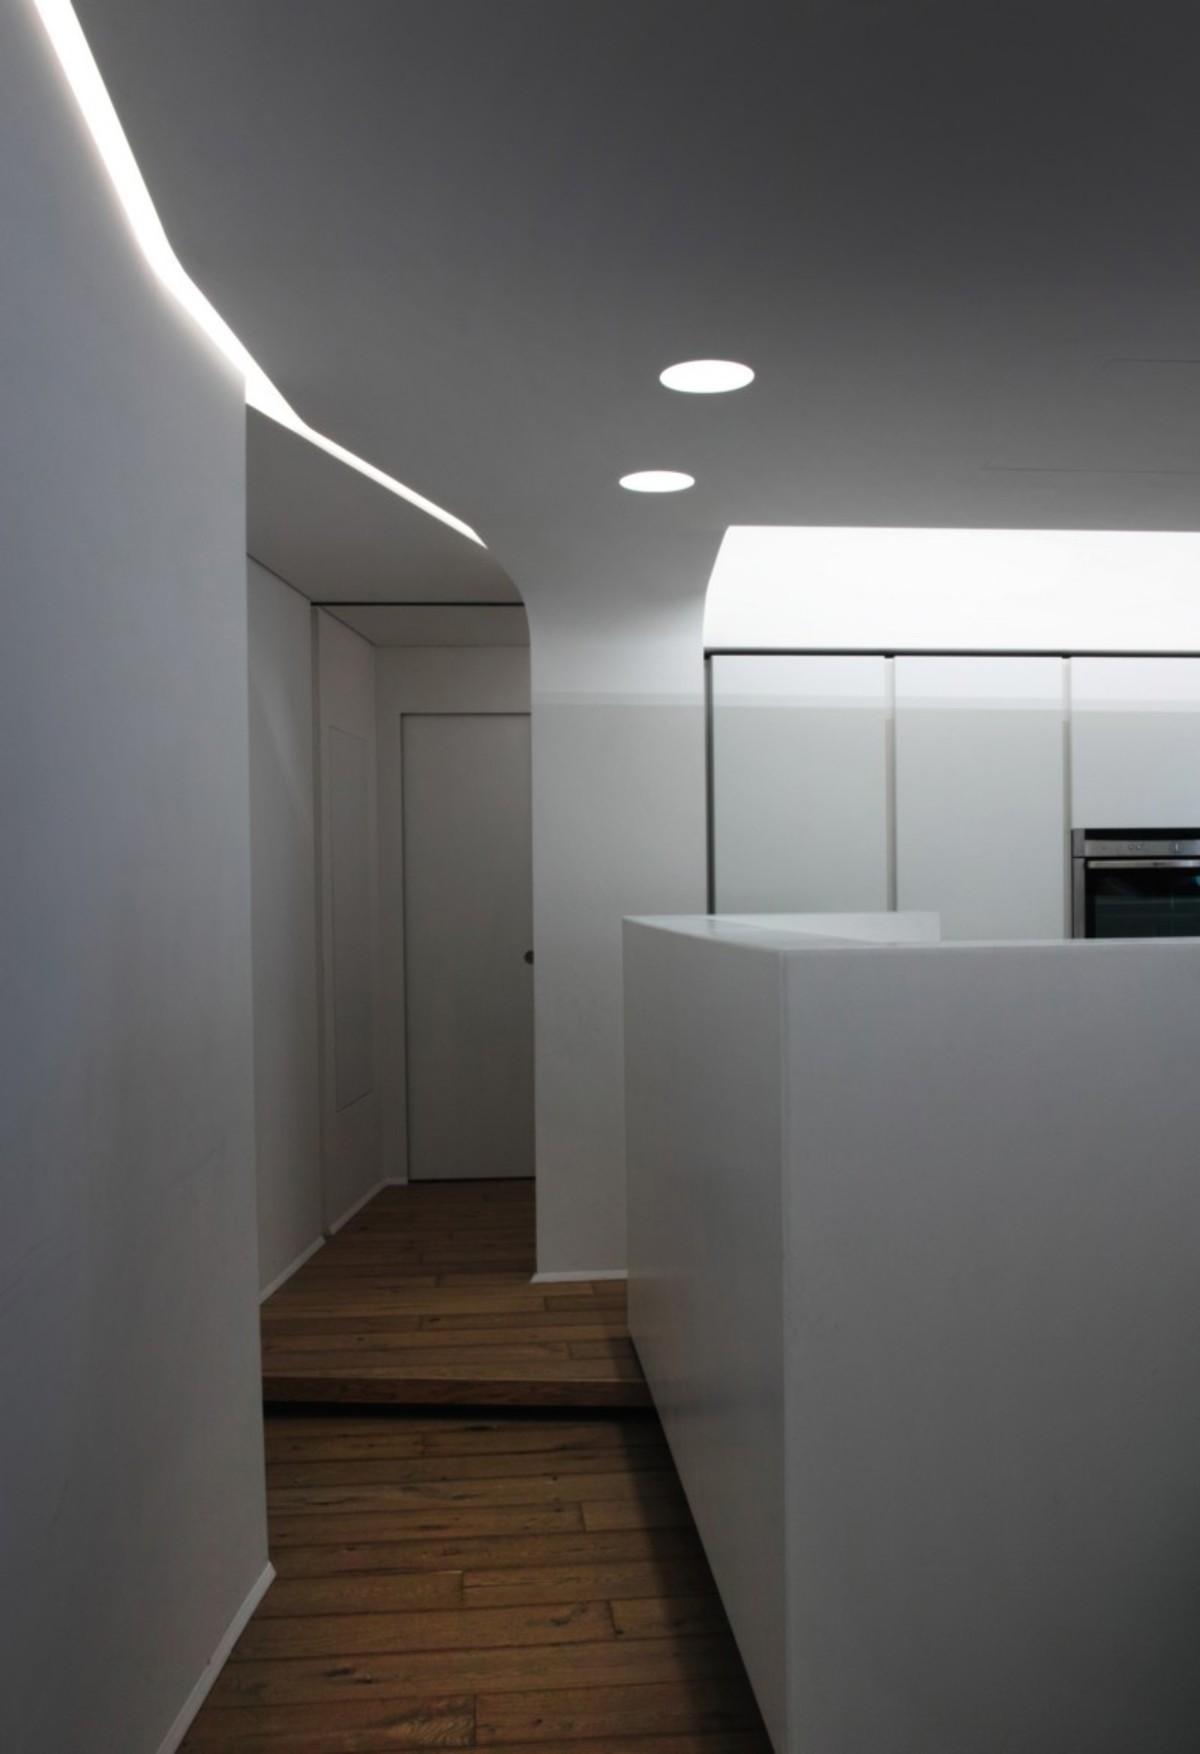 Architettura And Design architettura matassoni interior design for casa tli